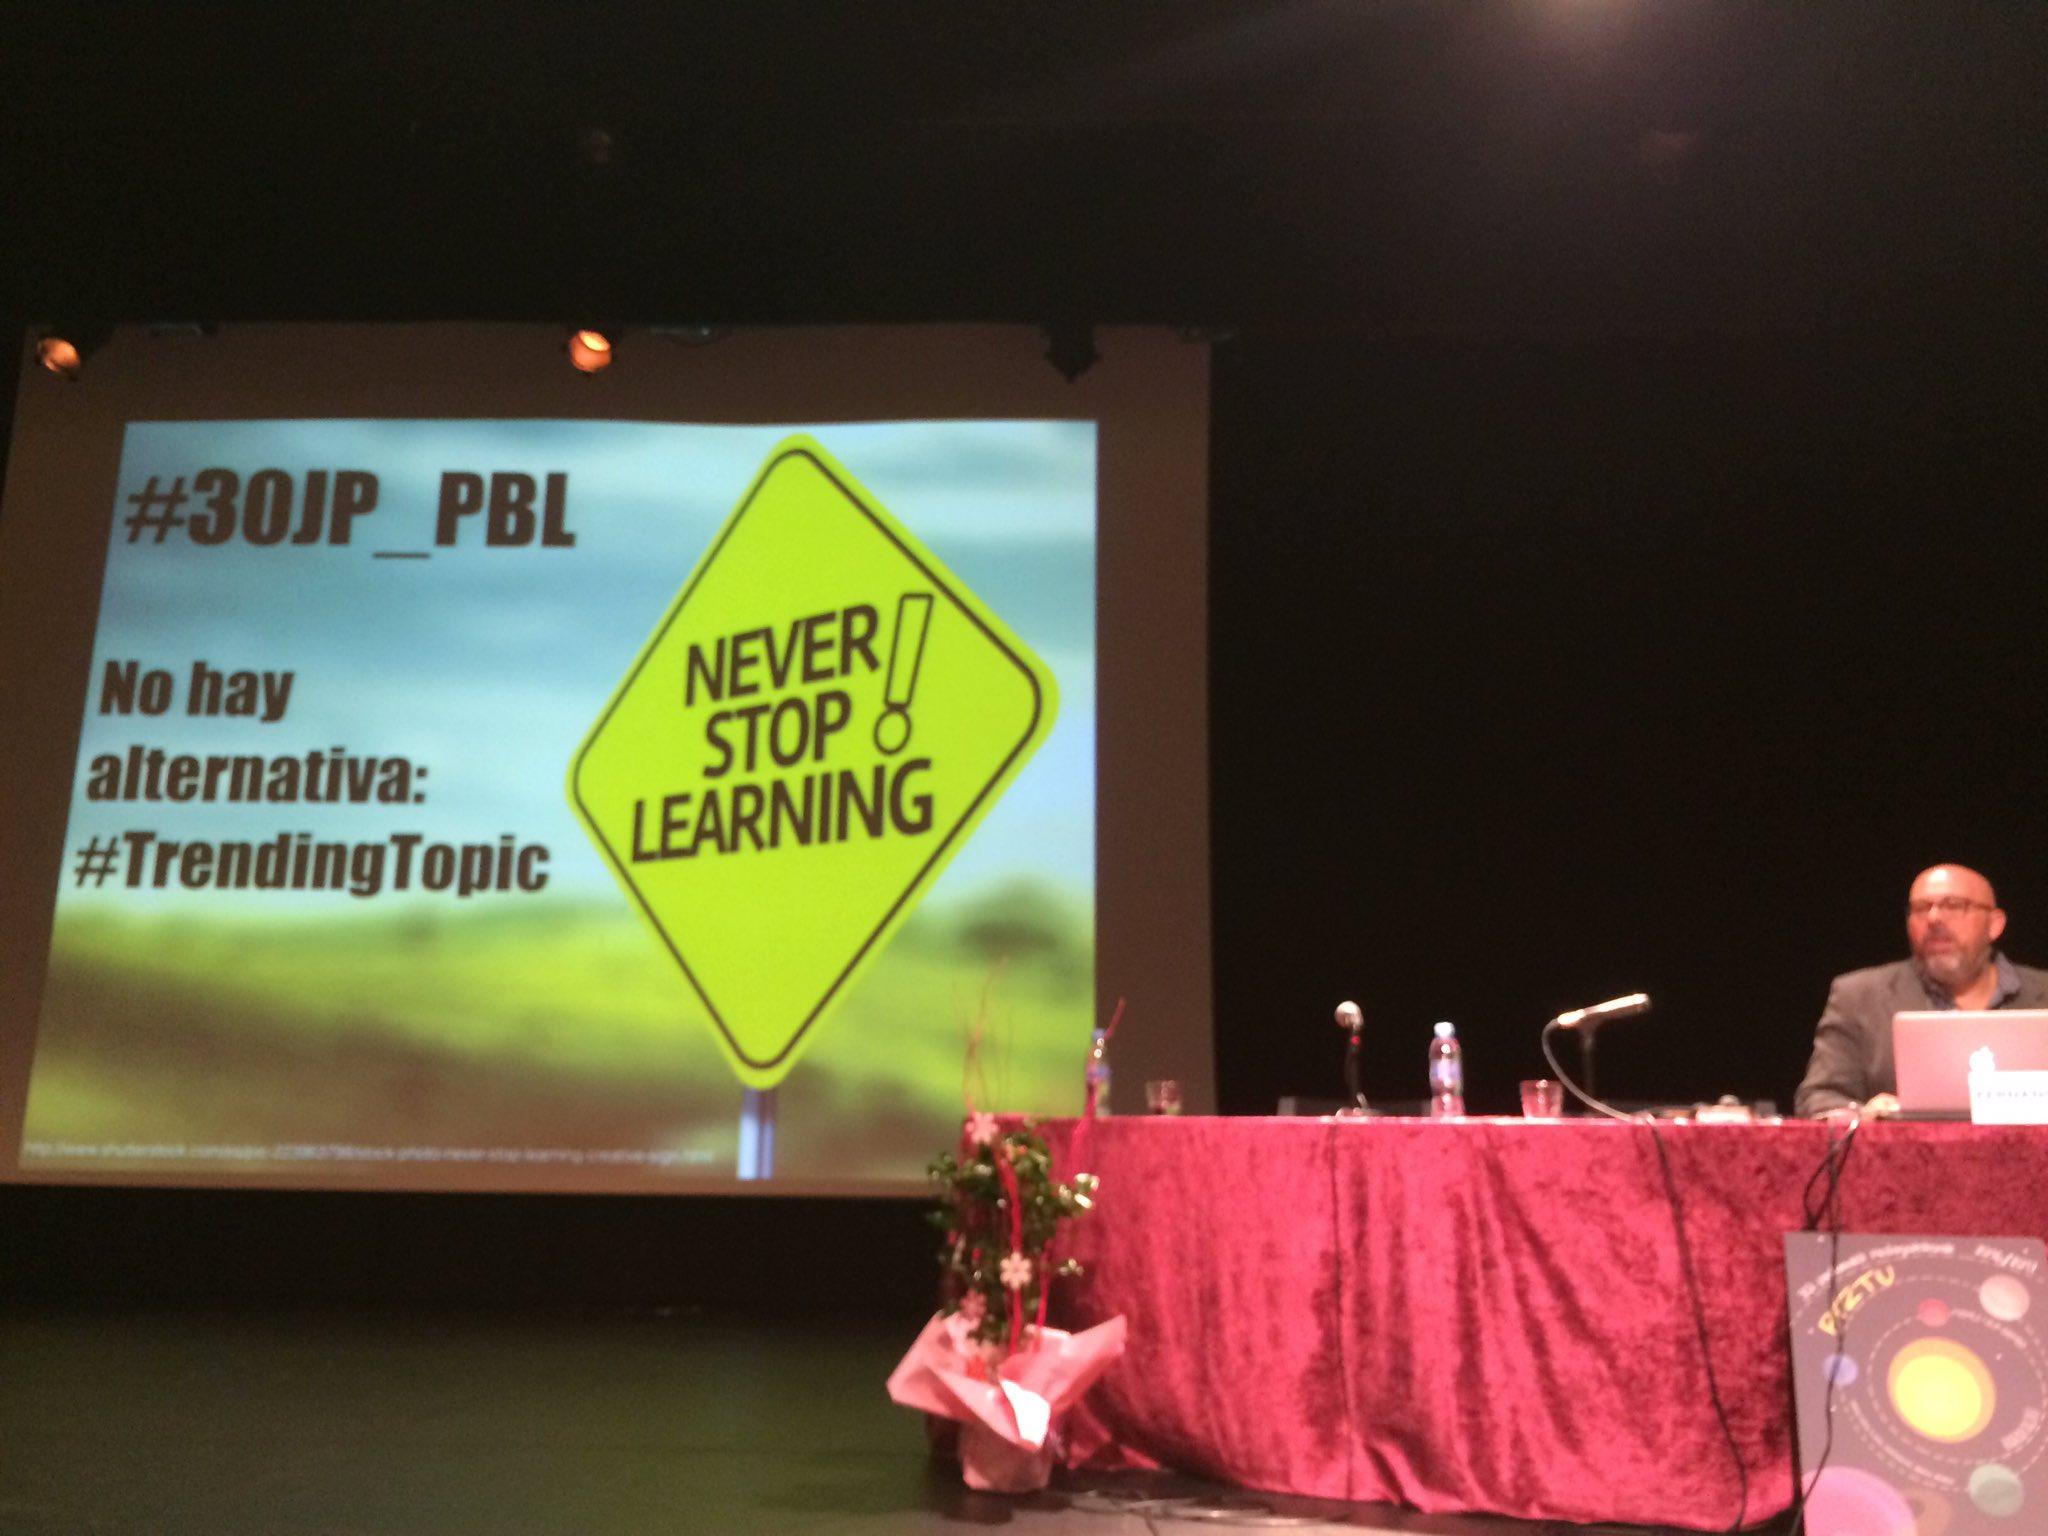 #30JP_PBL genial!!!!! Compartir y cooperar y difundir @ftsaez @susanalobela https://t.co/lqRGaIfF77